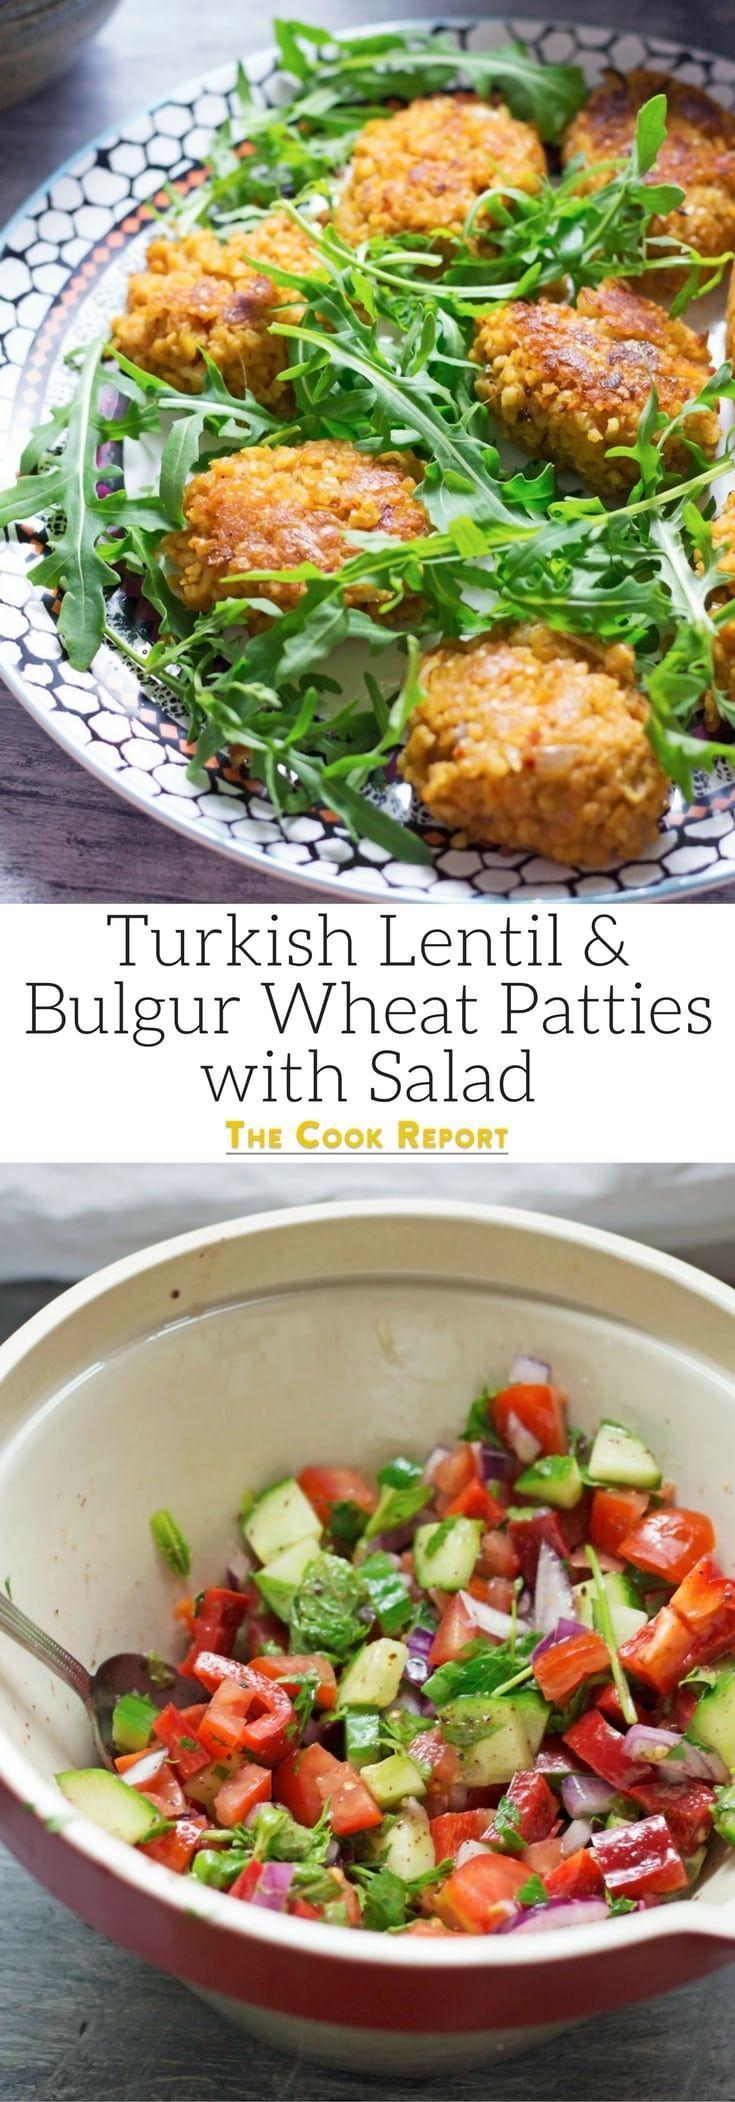 Turkish Lentil and Bulgur Wheat Patties with Salad